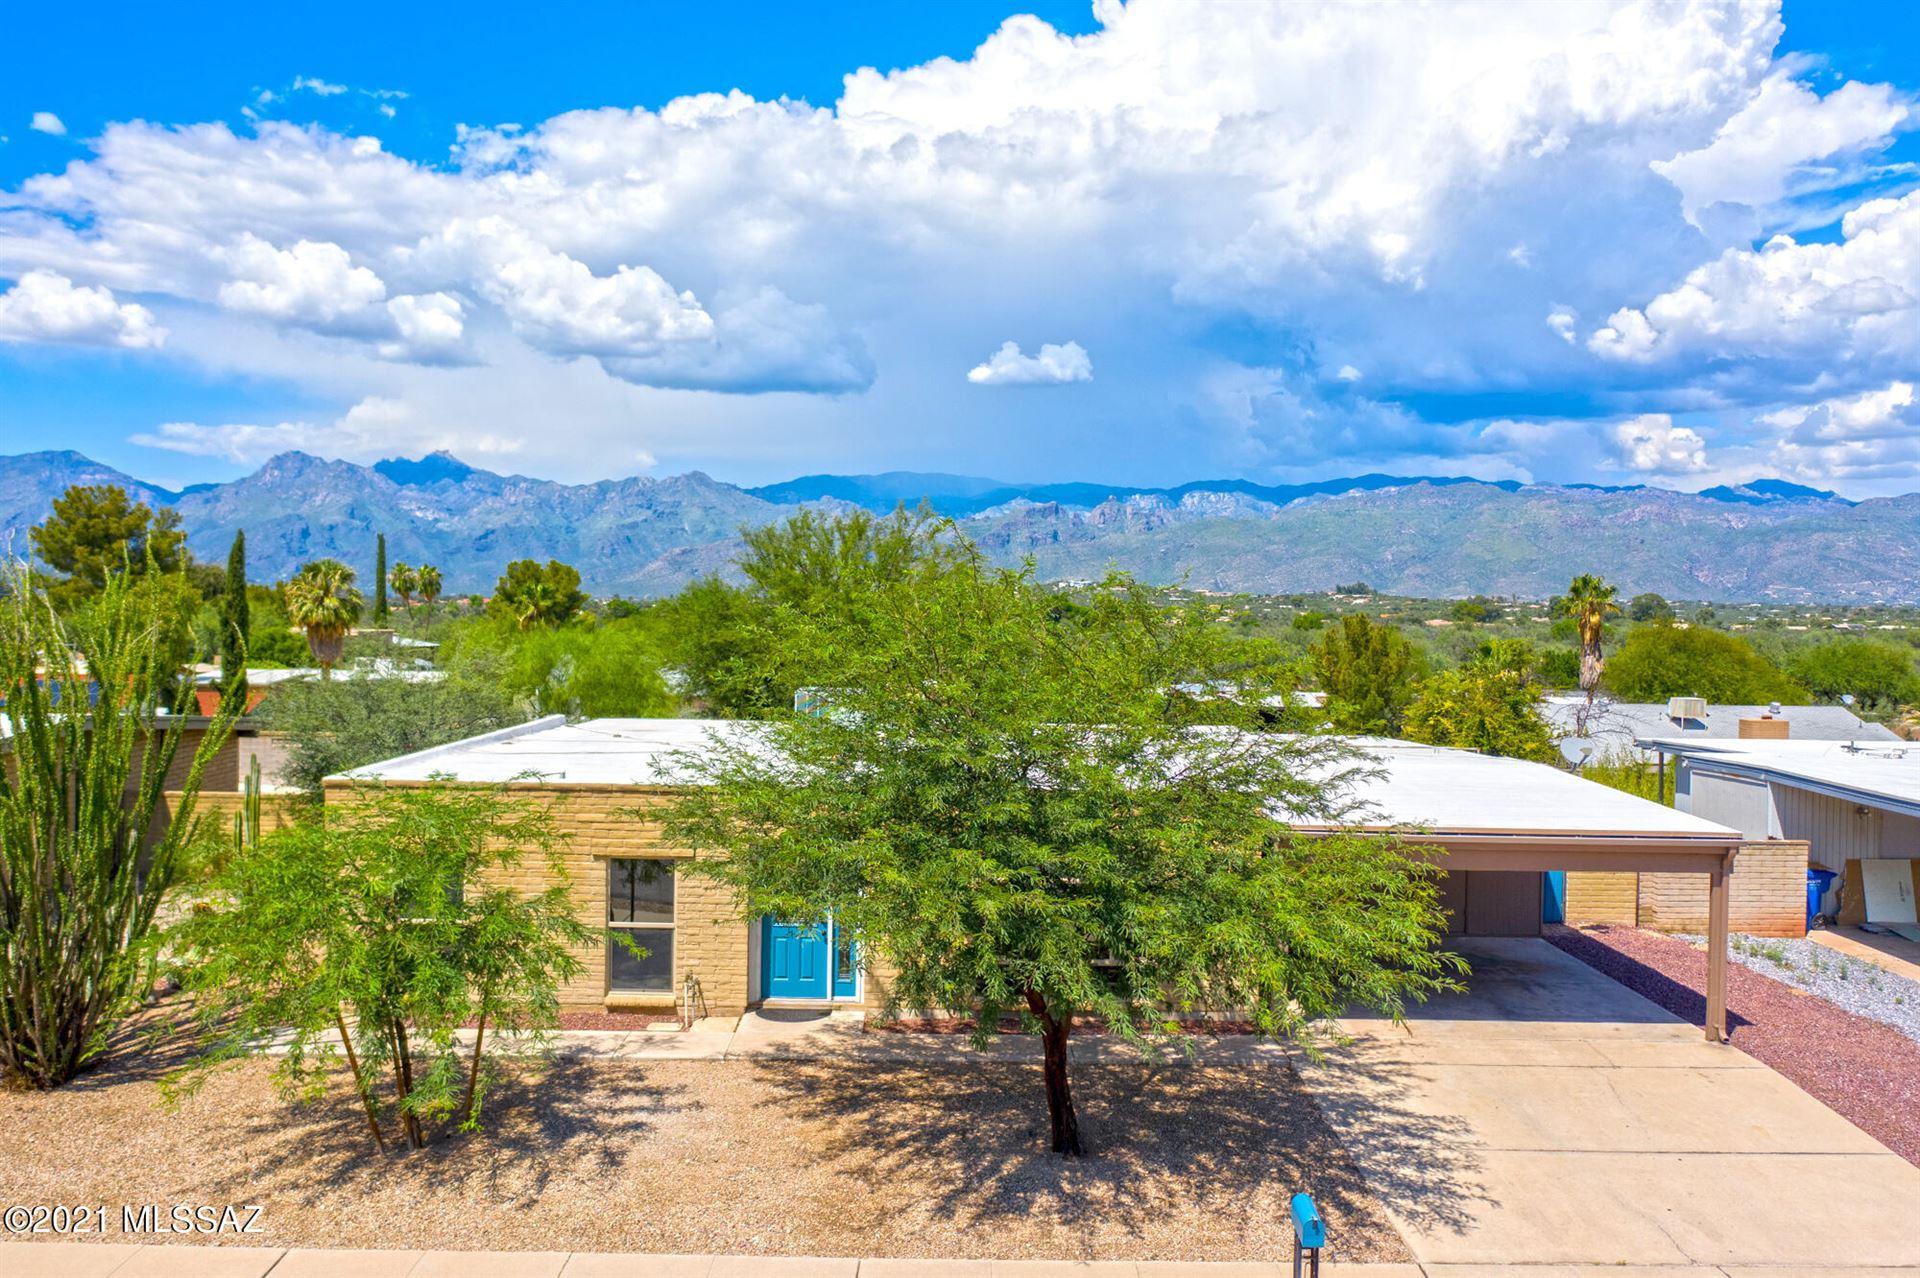 9565 E Calle Cascada, Tucson, AZ 85715 - MLS#: 22122945